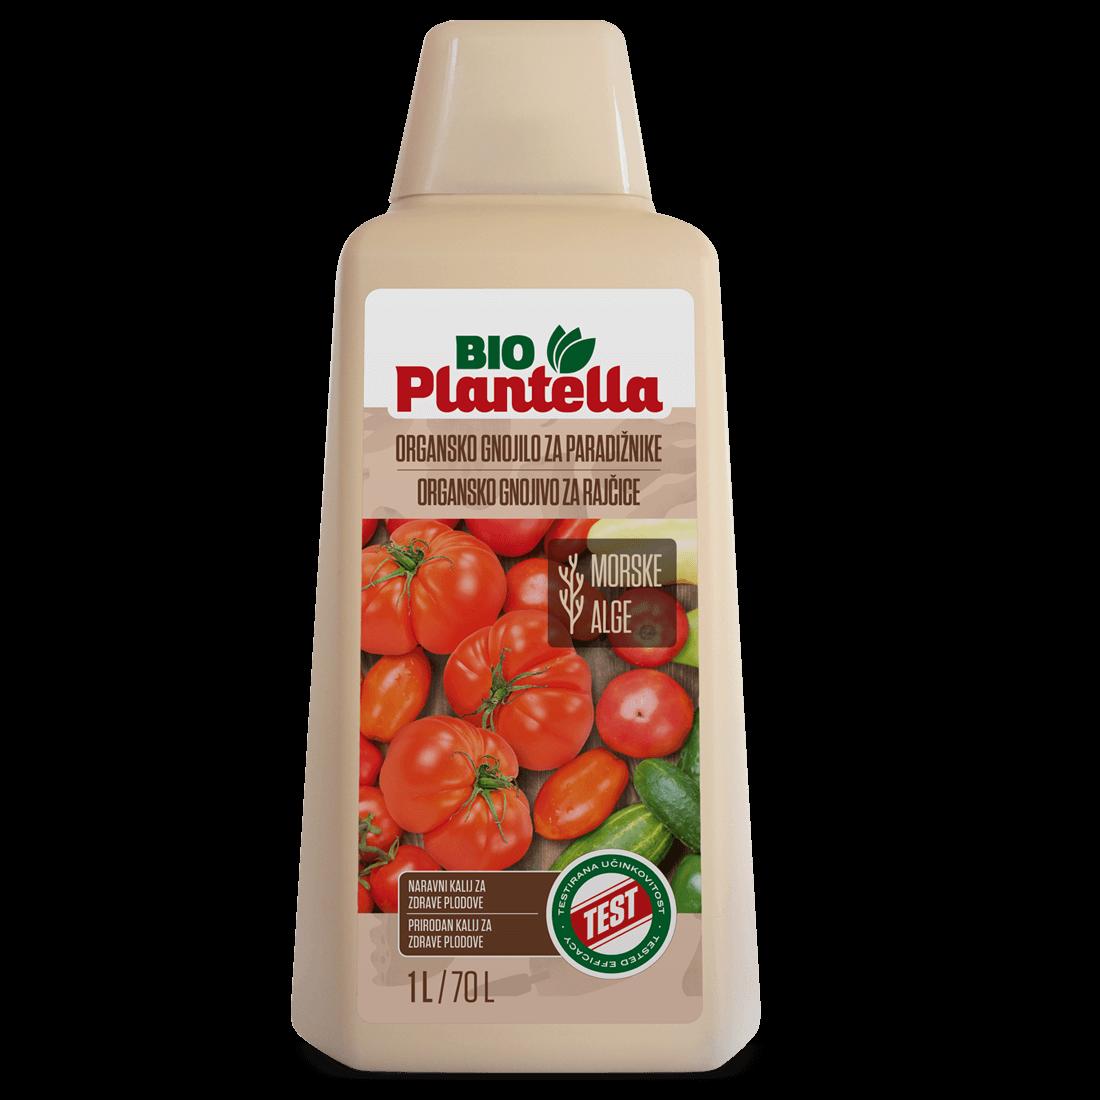 Bio-Plantella_Organsko-gnojilo-paradiznike_1L_SI-HR